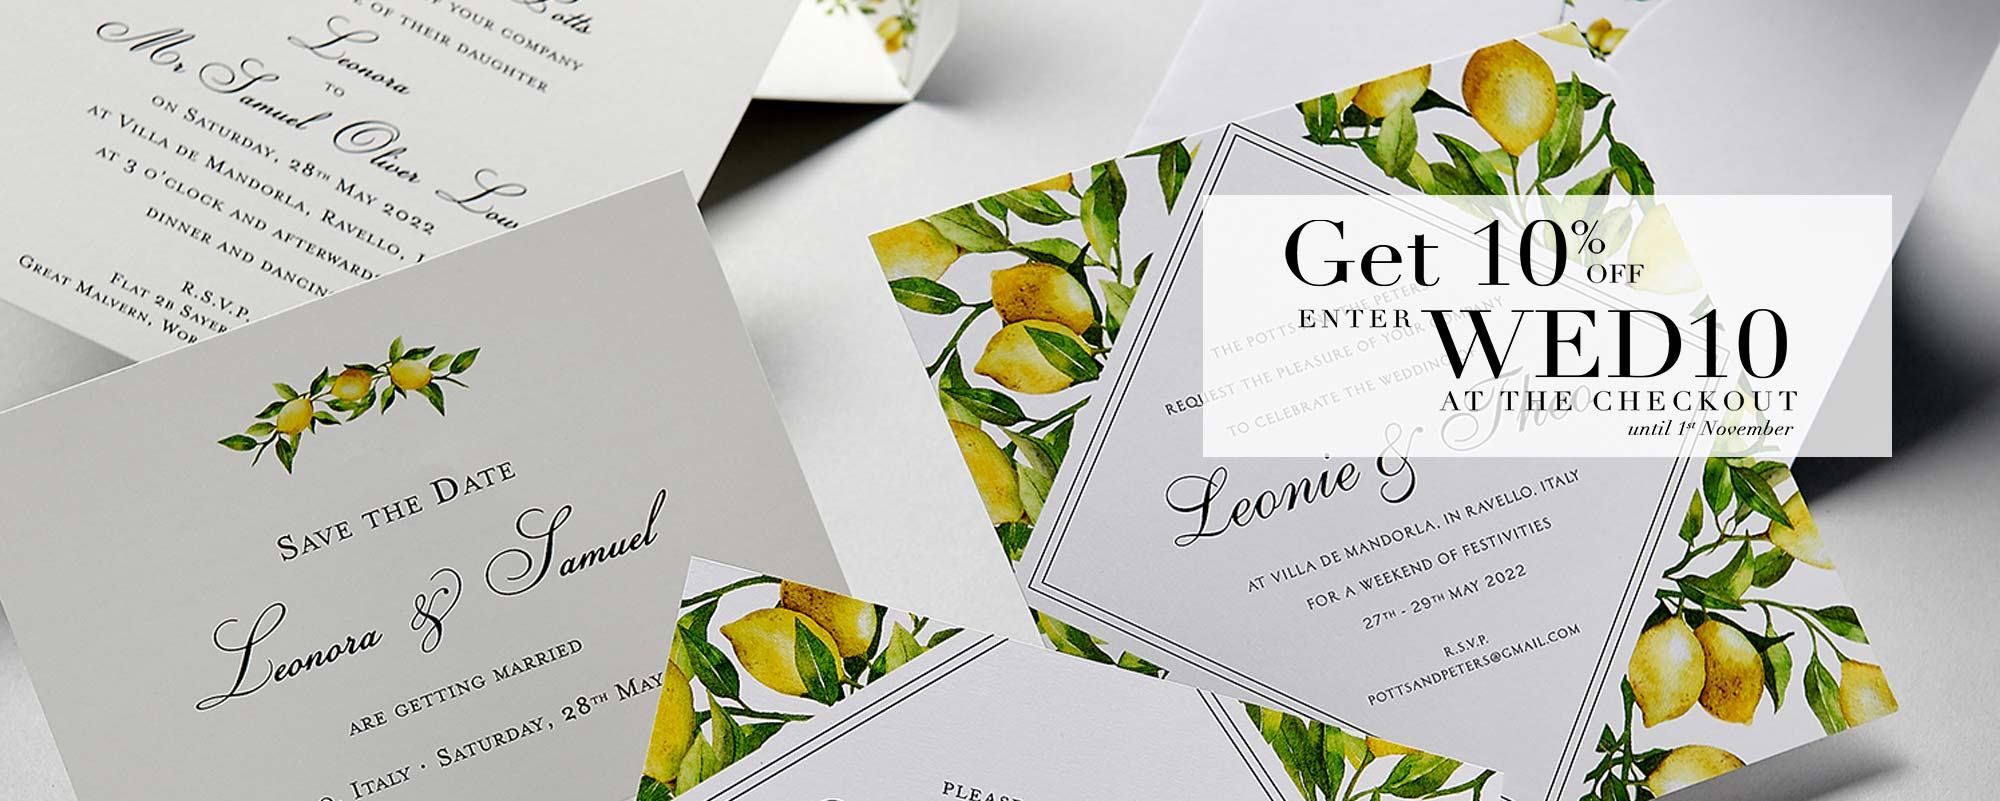 Elegant Wedding Stationery Personal Stationery Geebrothers Co Uk